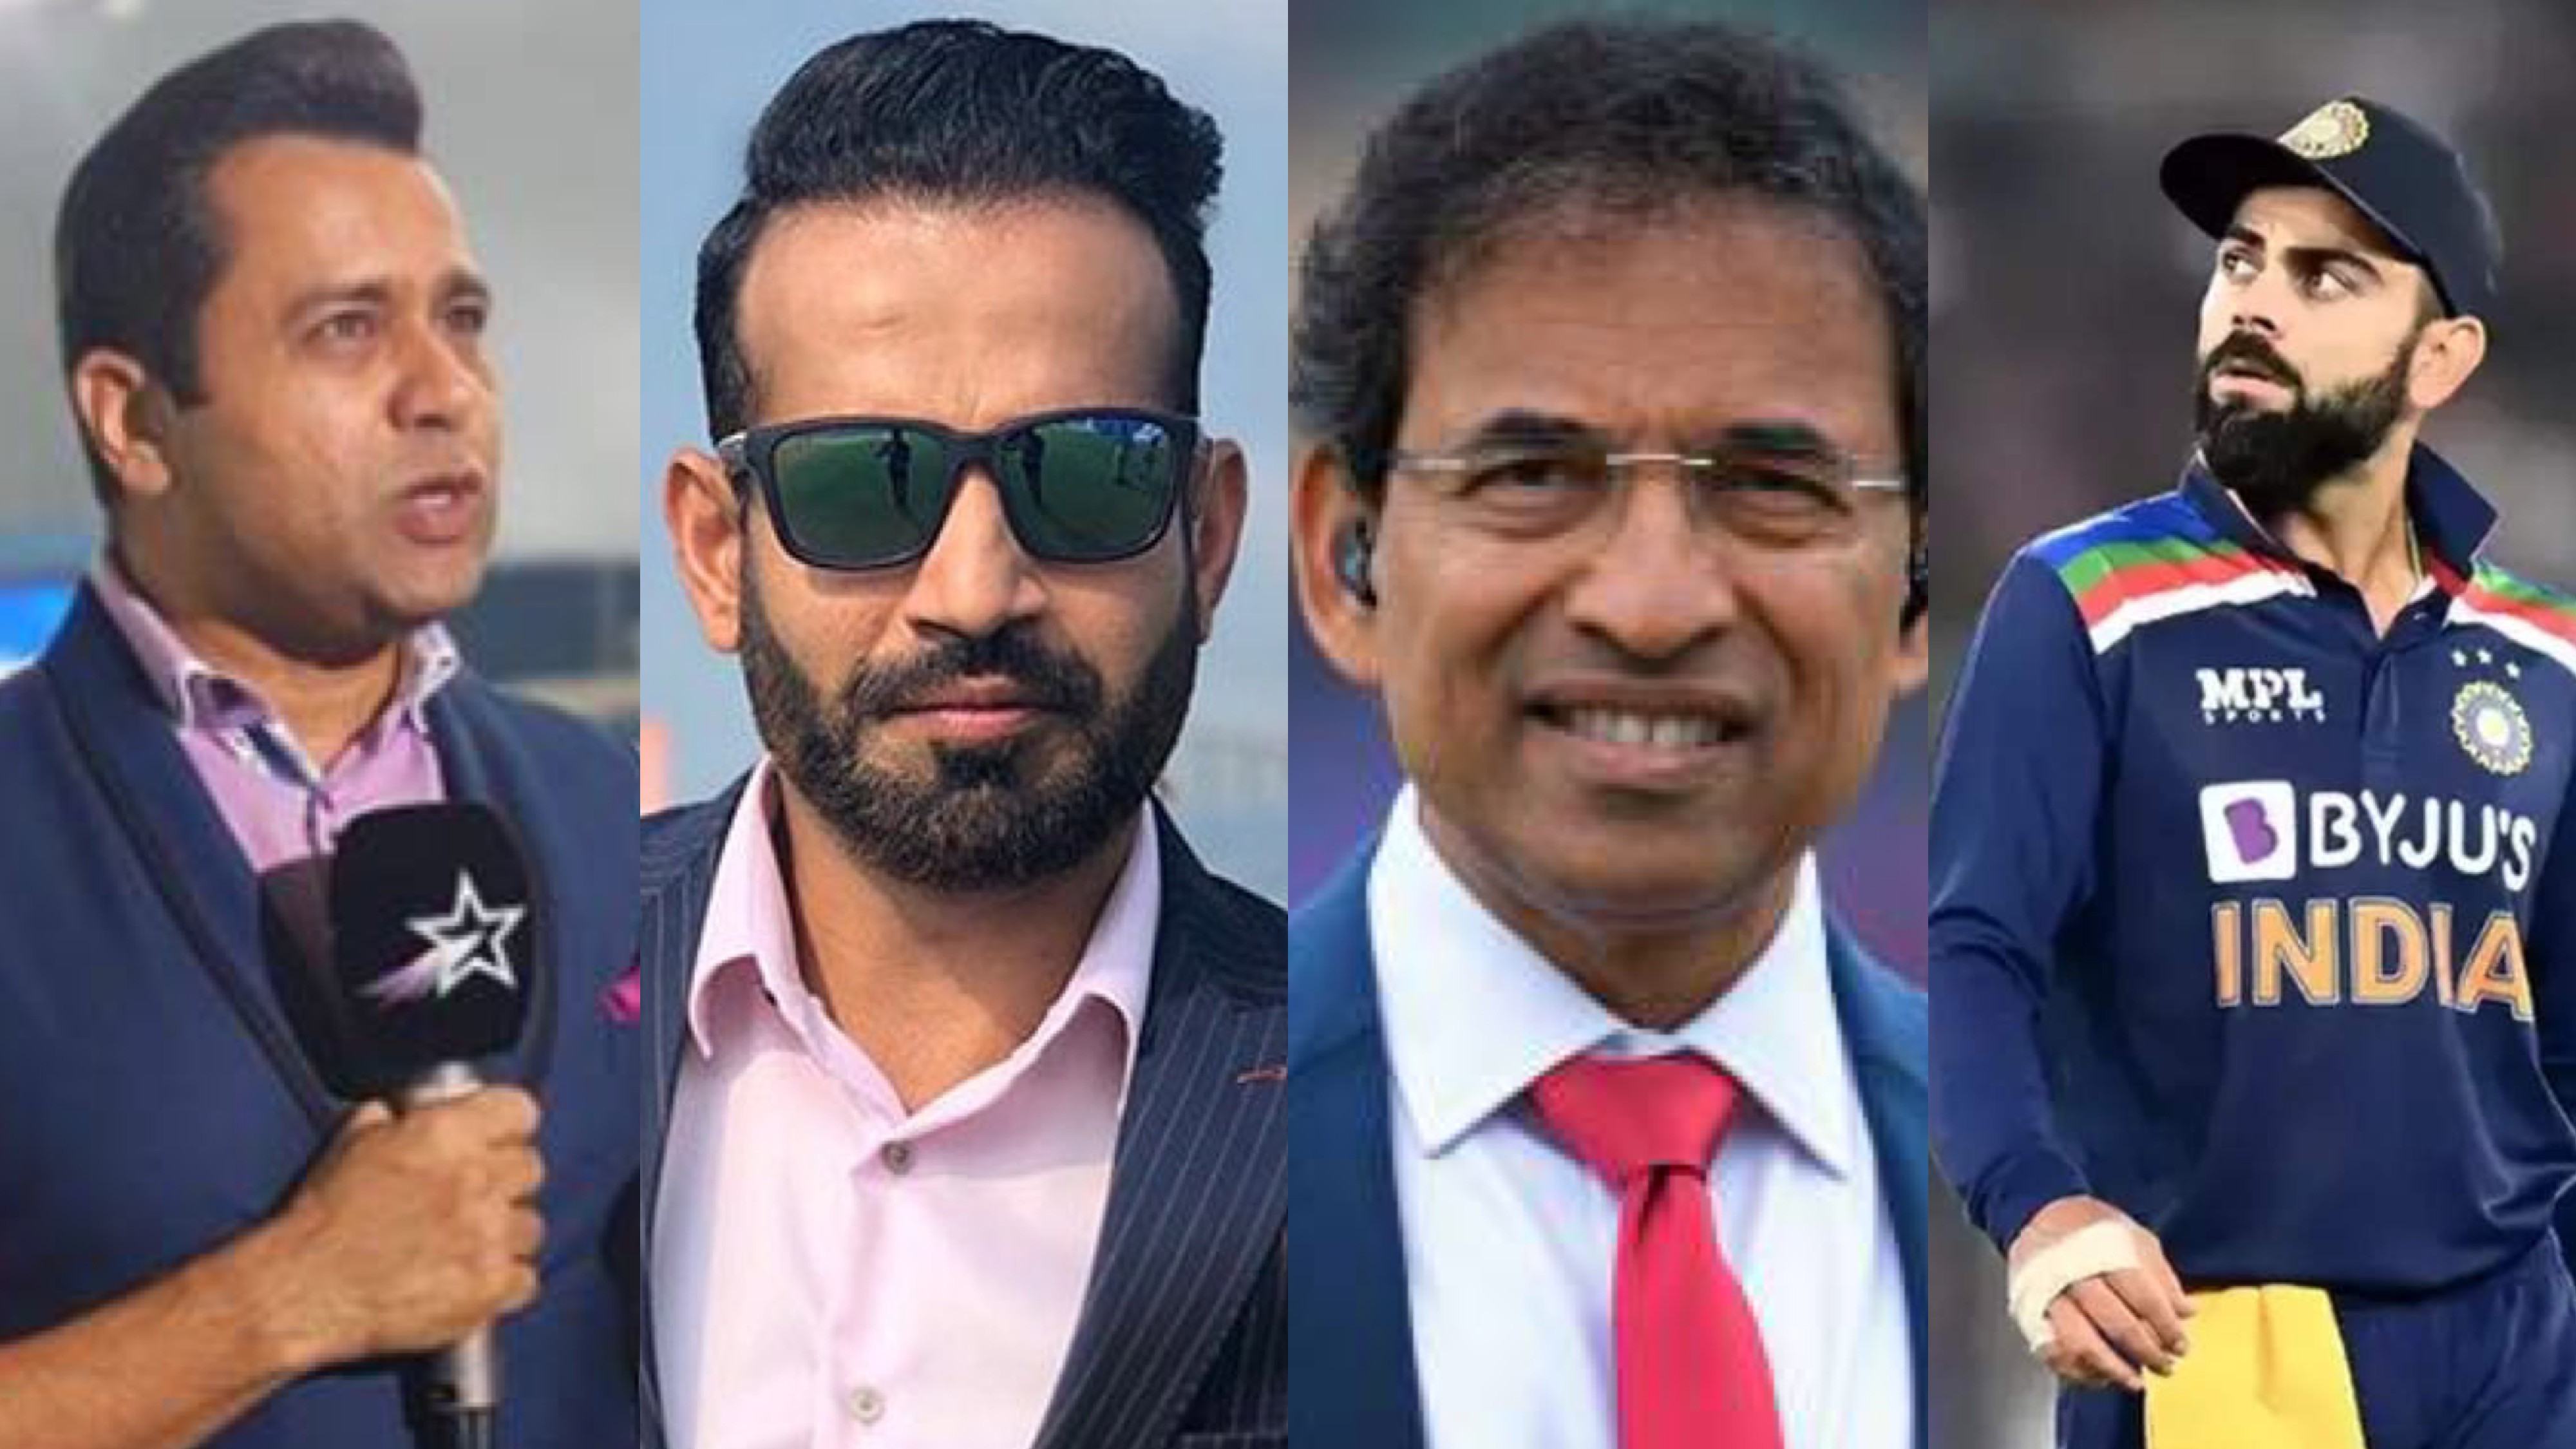 Aakash Chopra, Irfan Pathan, Harsha Bhogle react to Virat Kohli stepping down as T20I captain